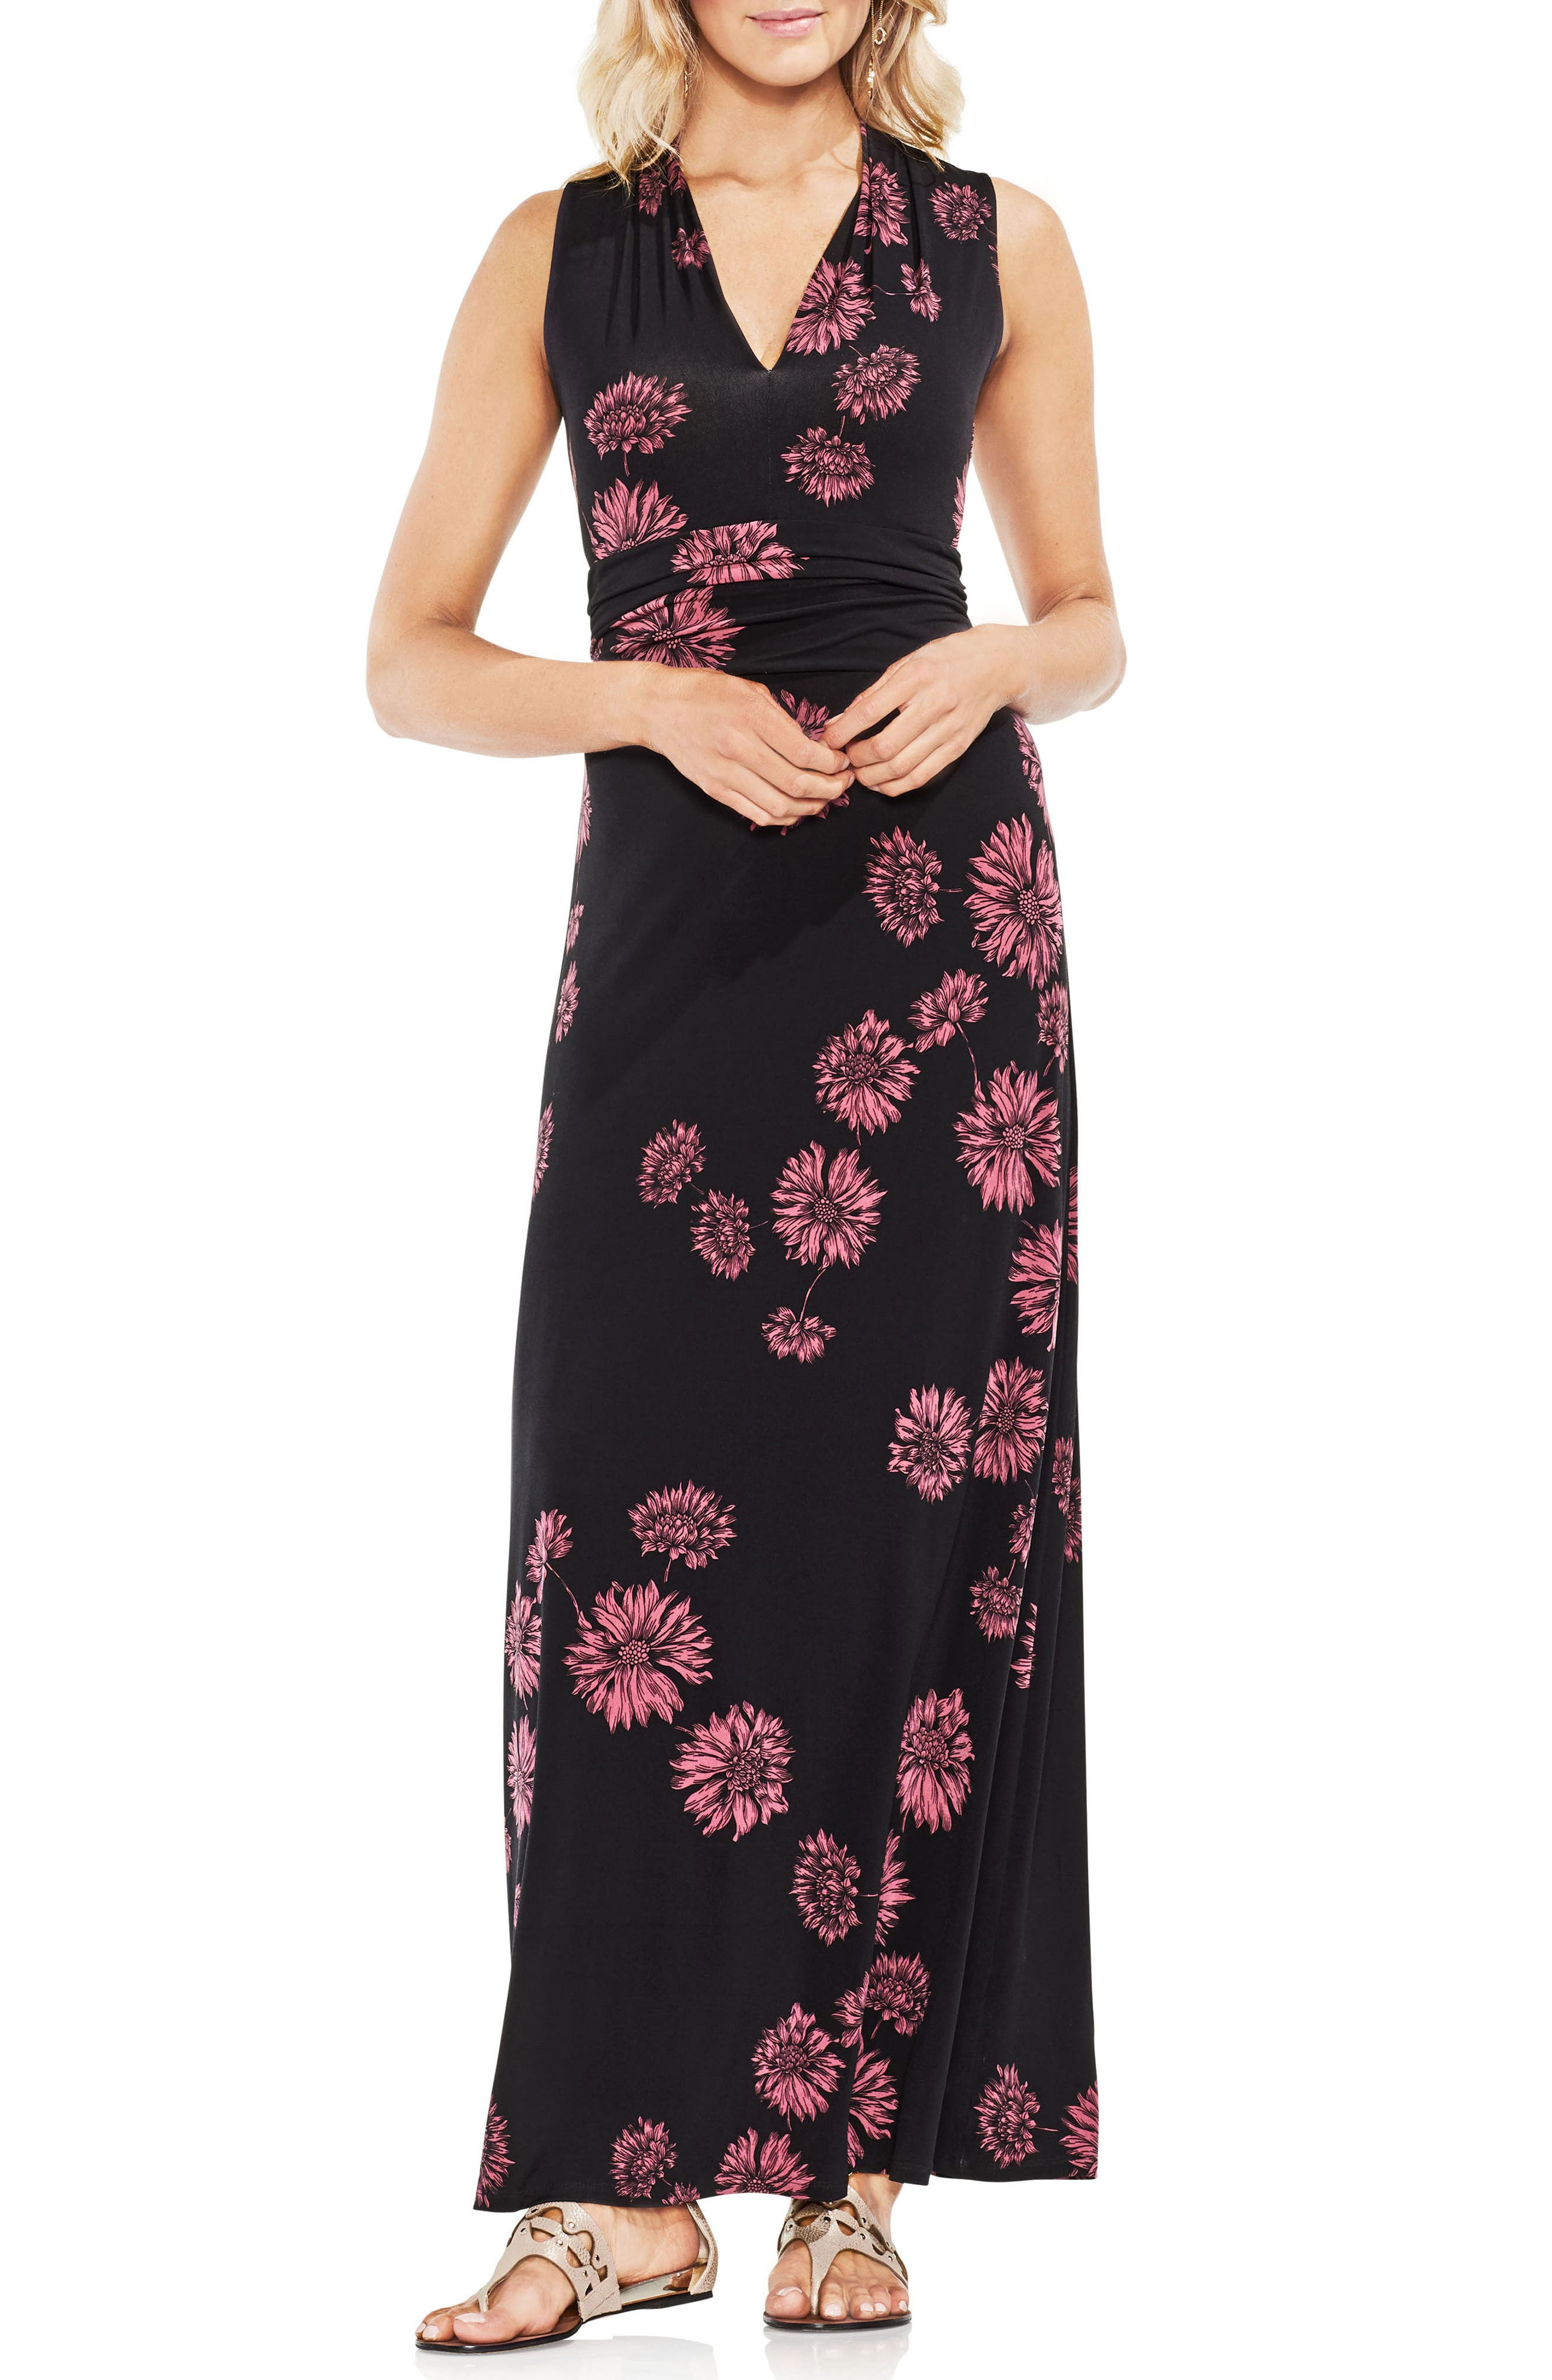 Chateau Floral Halter Maxi Dress,                             Main thumbnail 1, color,